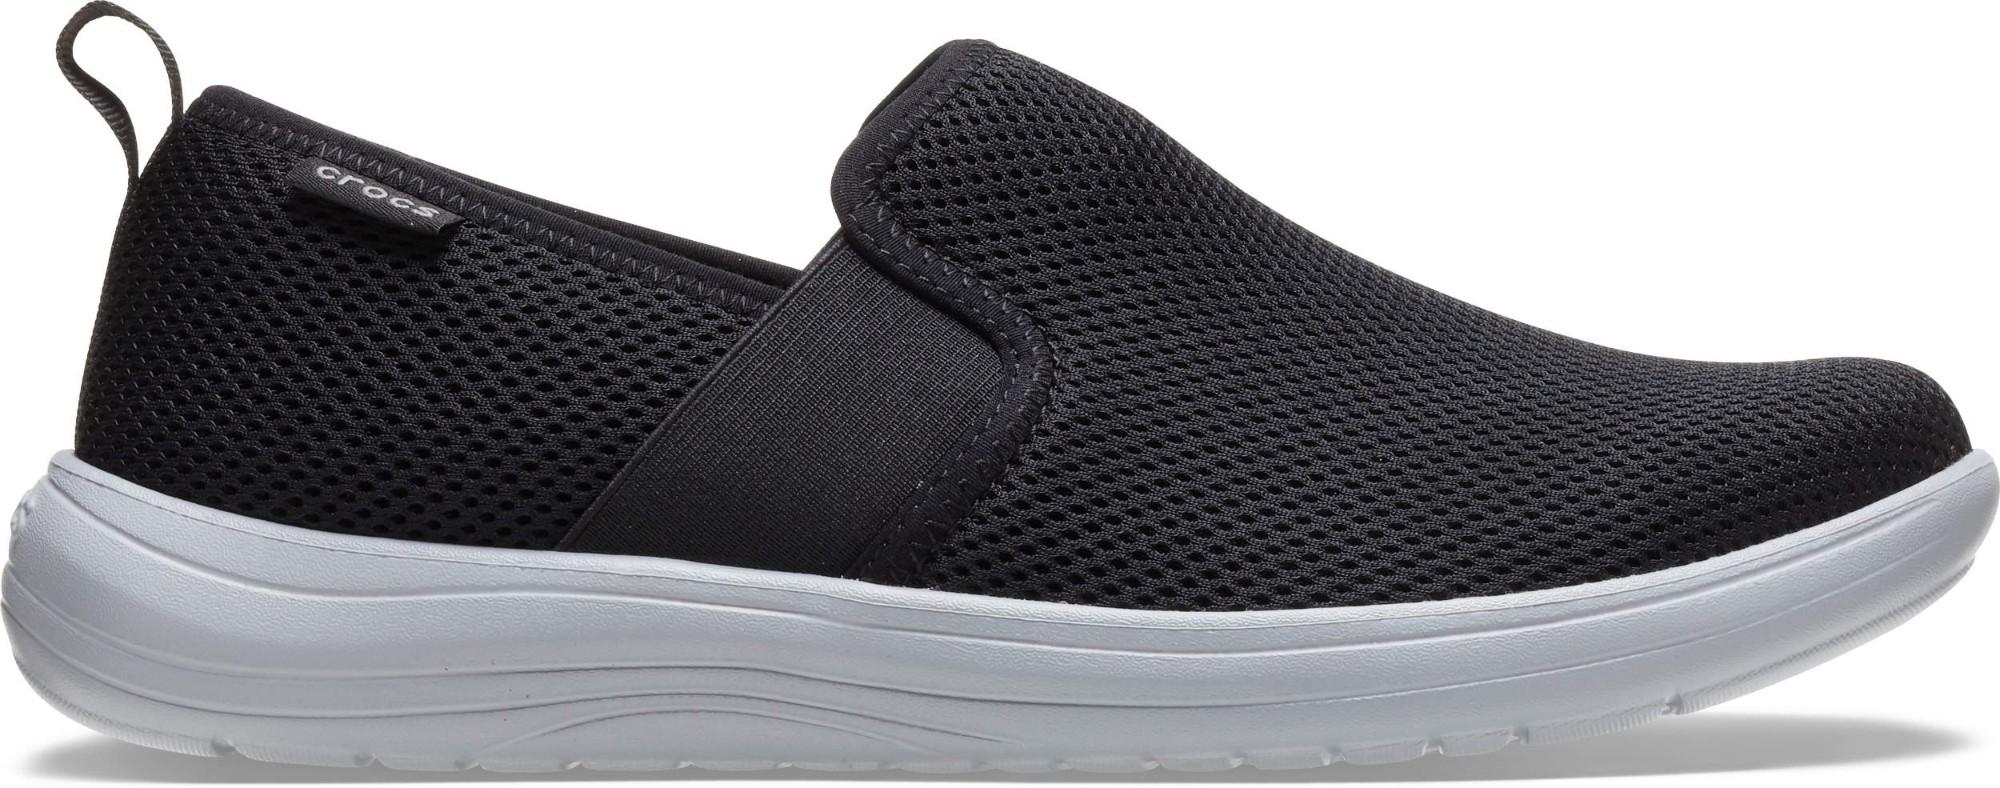 Crocs™ Reviva Low Slip-On Men's Black/Light Grey 42,5